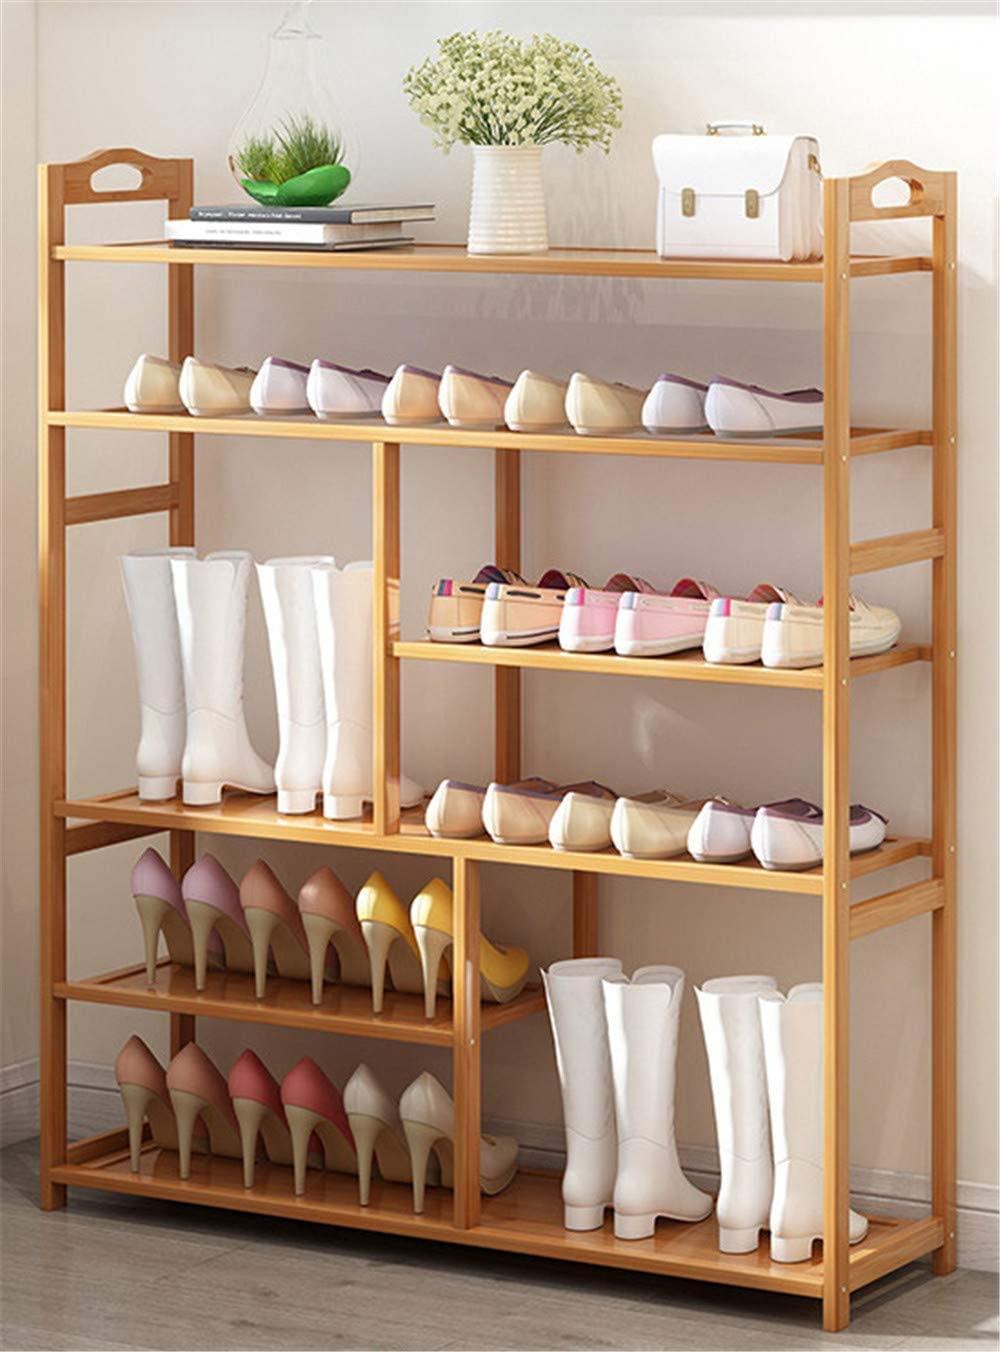 ZJDU Natural Bamboo Wooden Shoe Rack, Free Standing Shelves, Bamboo Shoe Rack Storage Organiser Entryway Shoe Shelf, Made of 100% Natural Bamboo,6Tier100×25×106cm